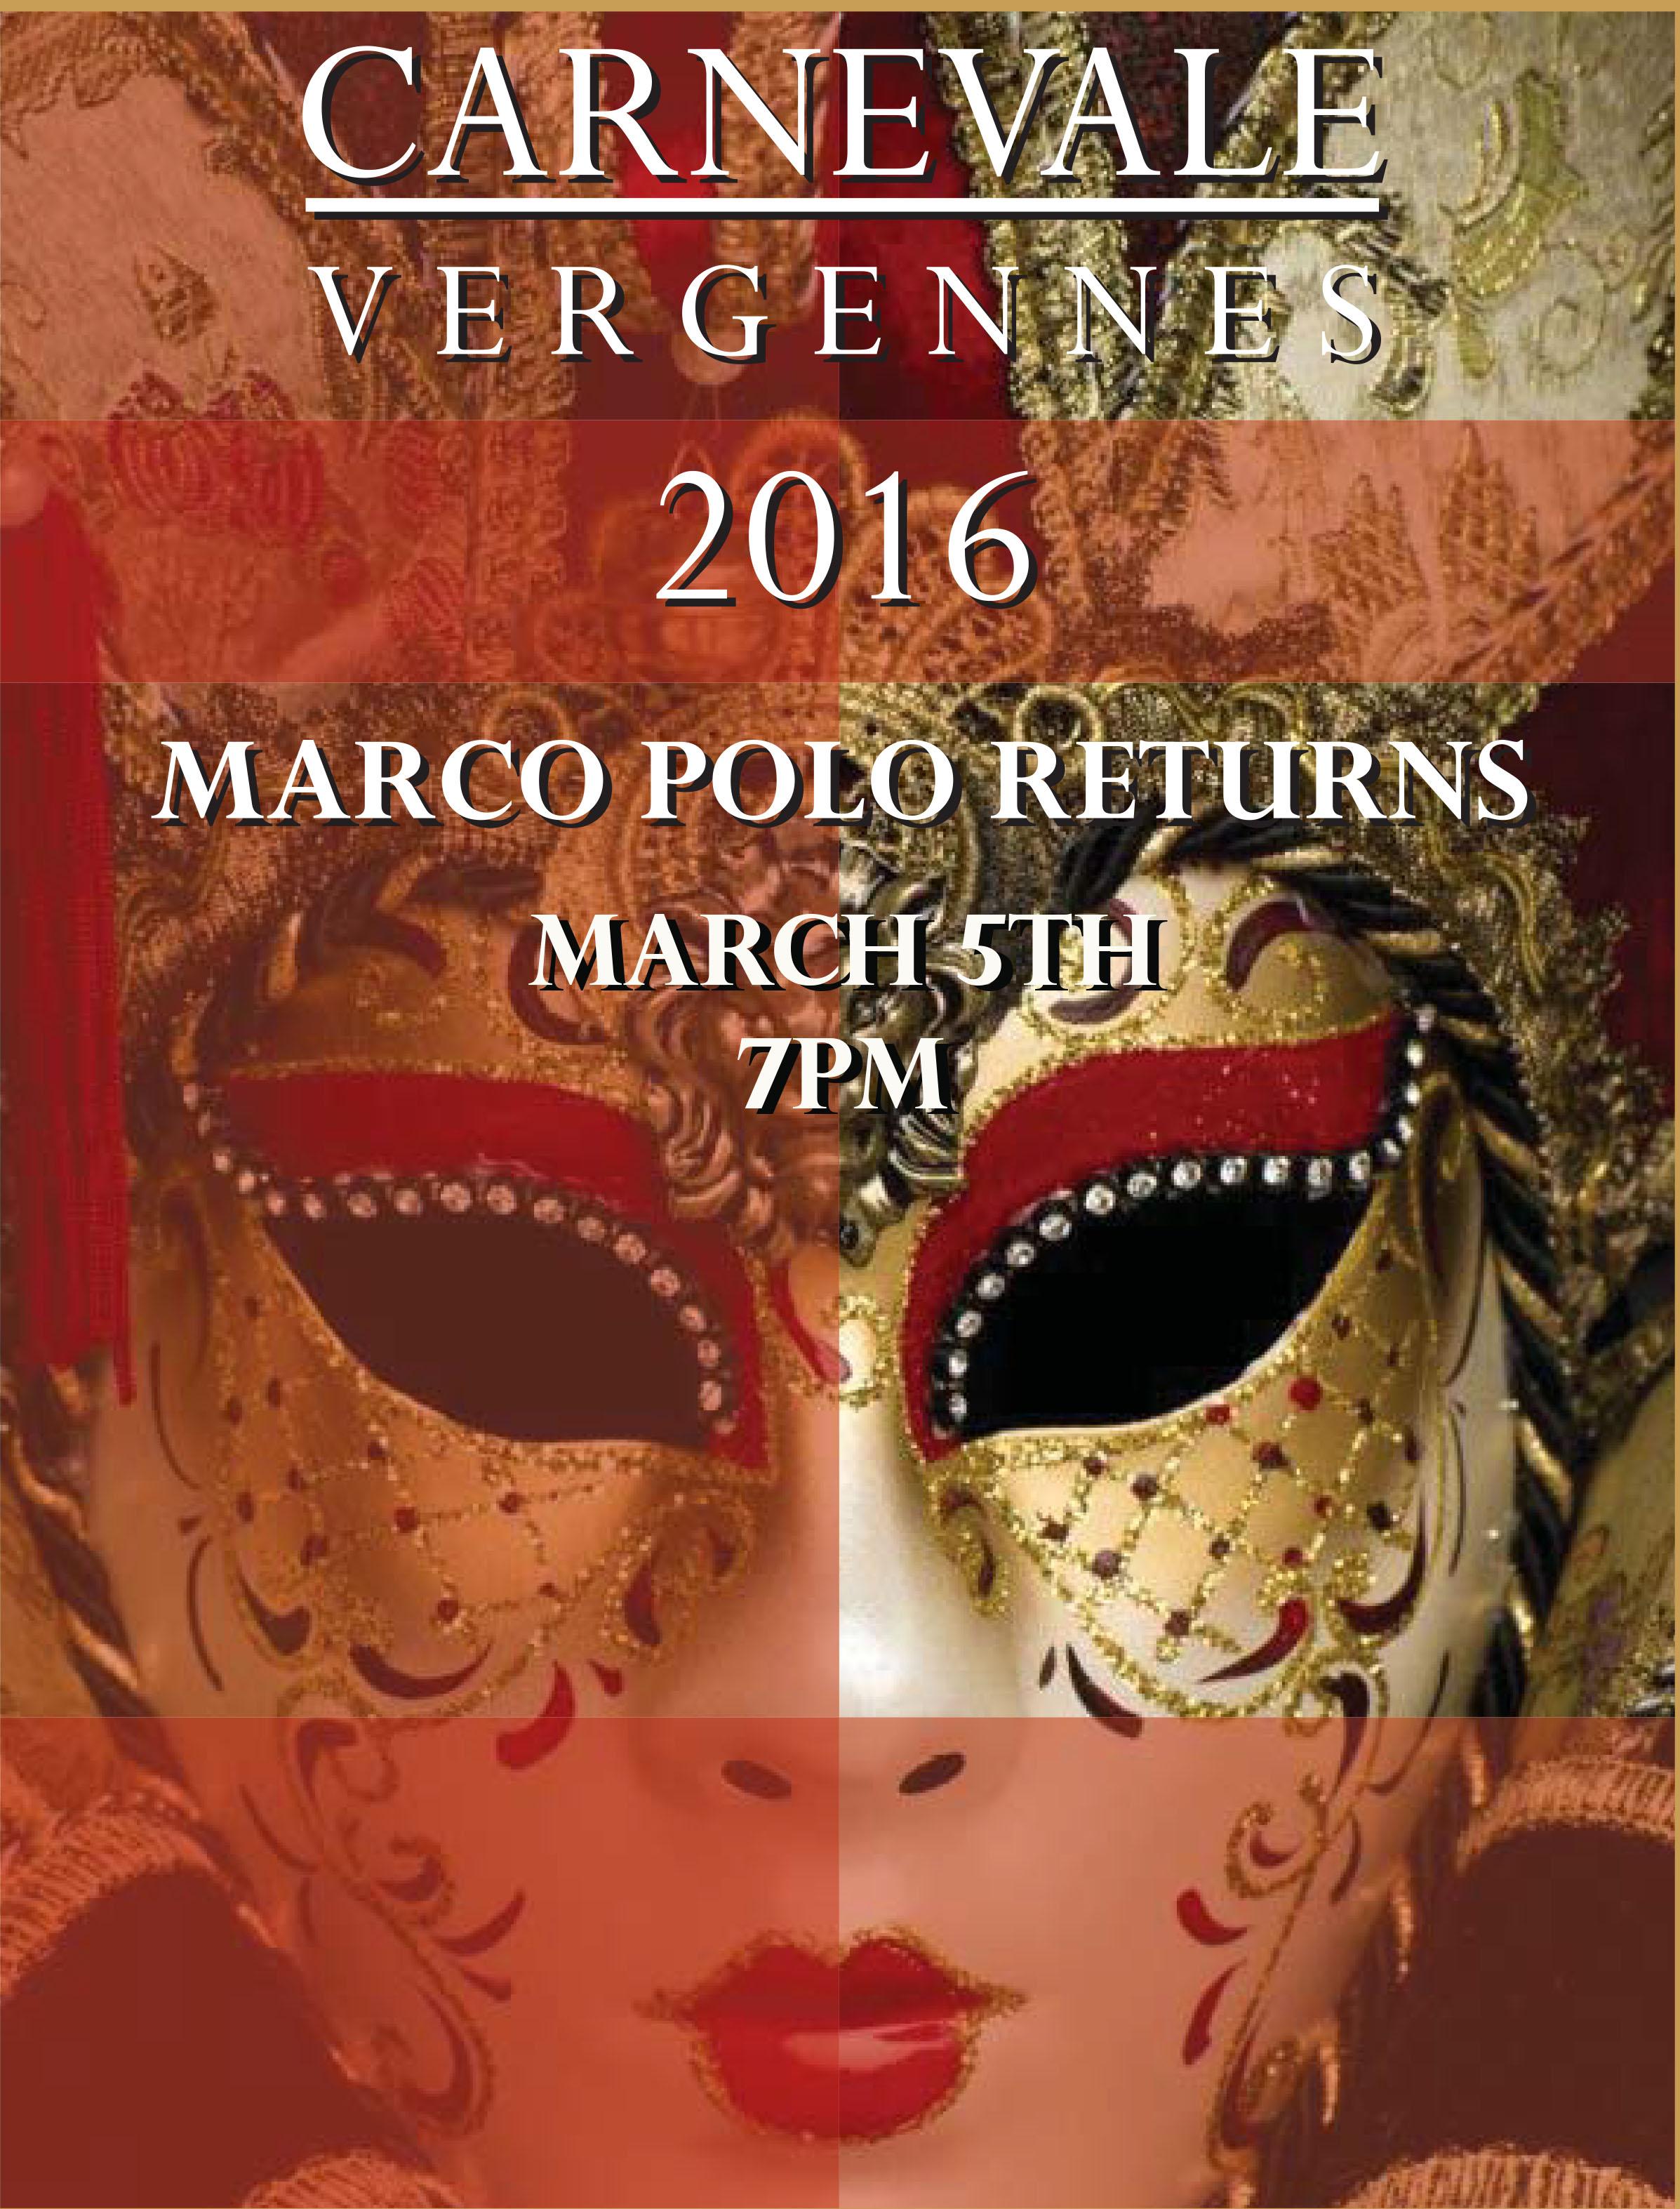 Carnevale Vergennes